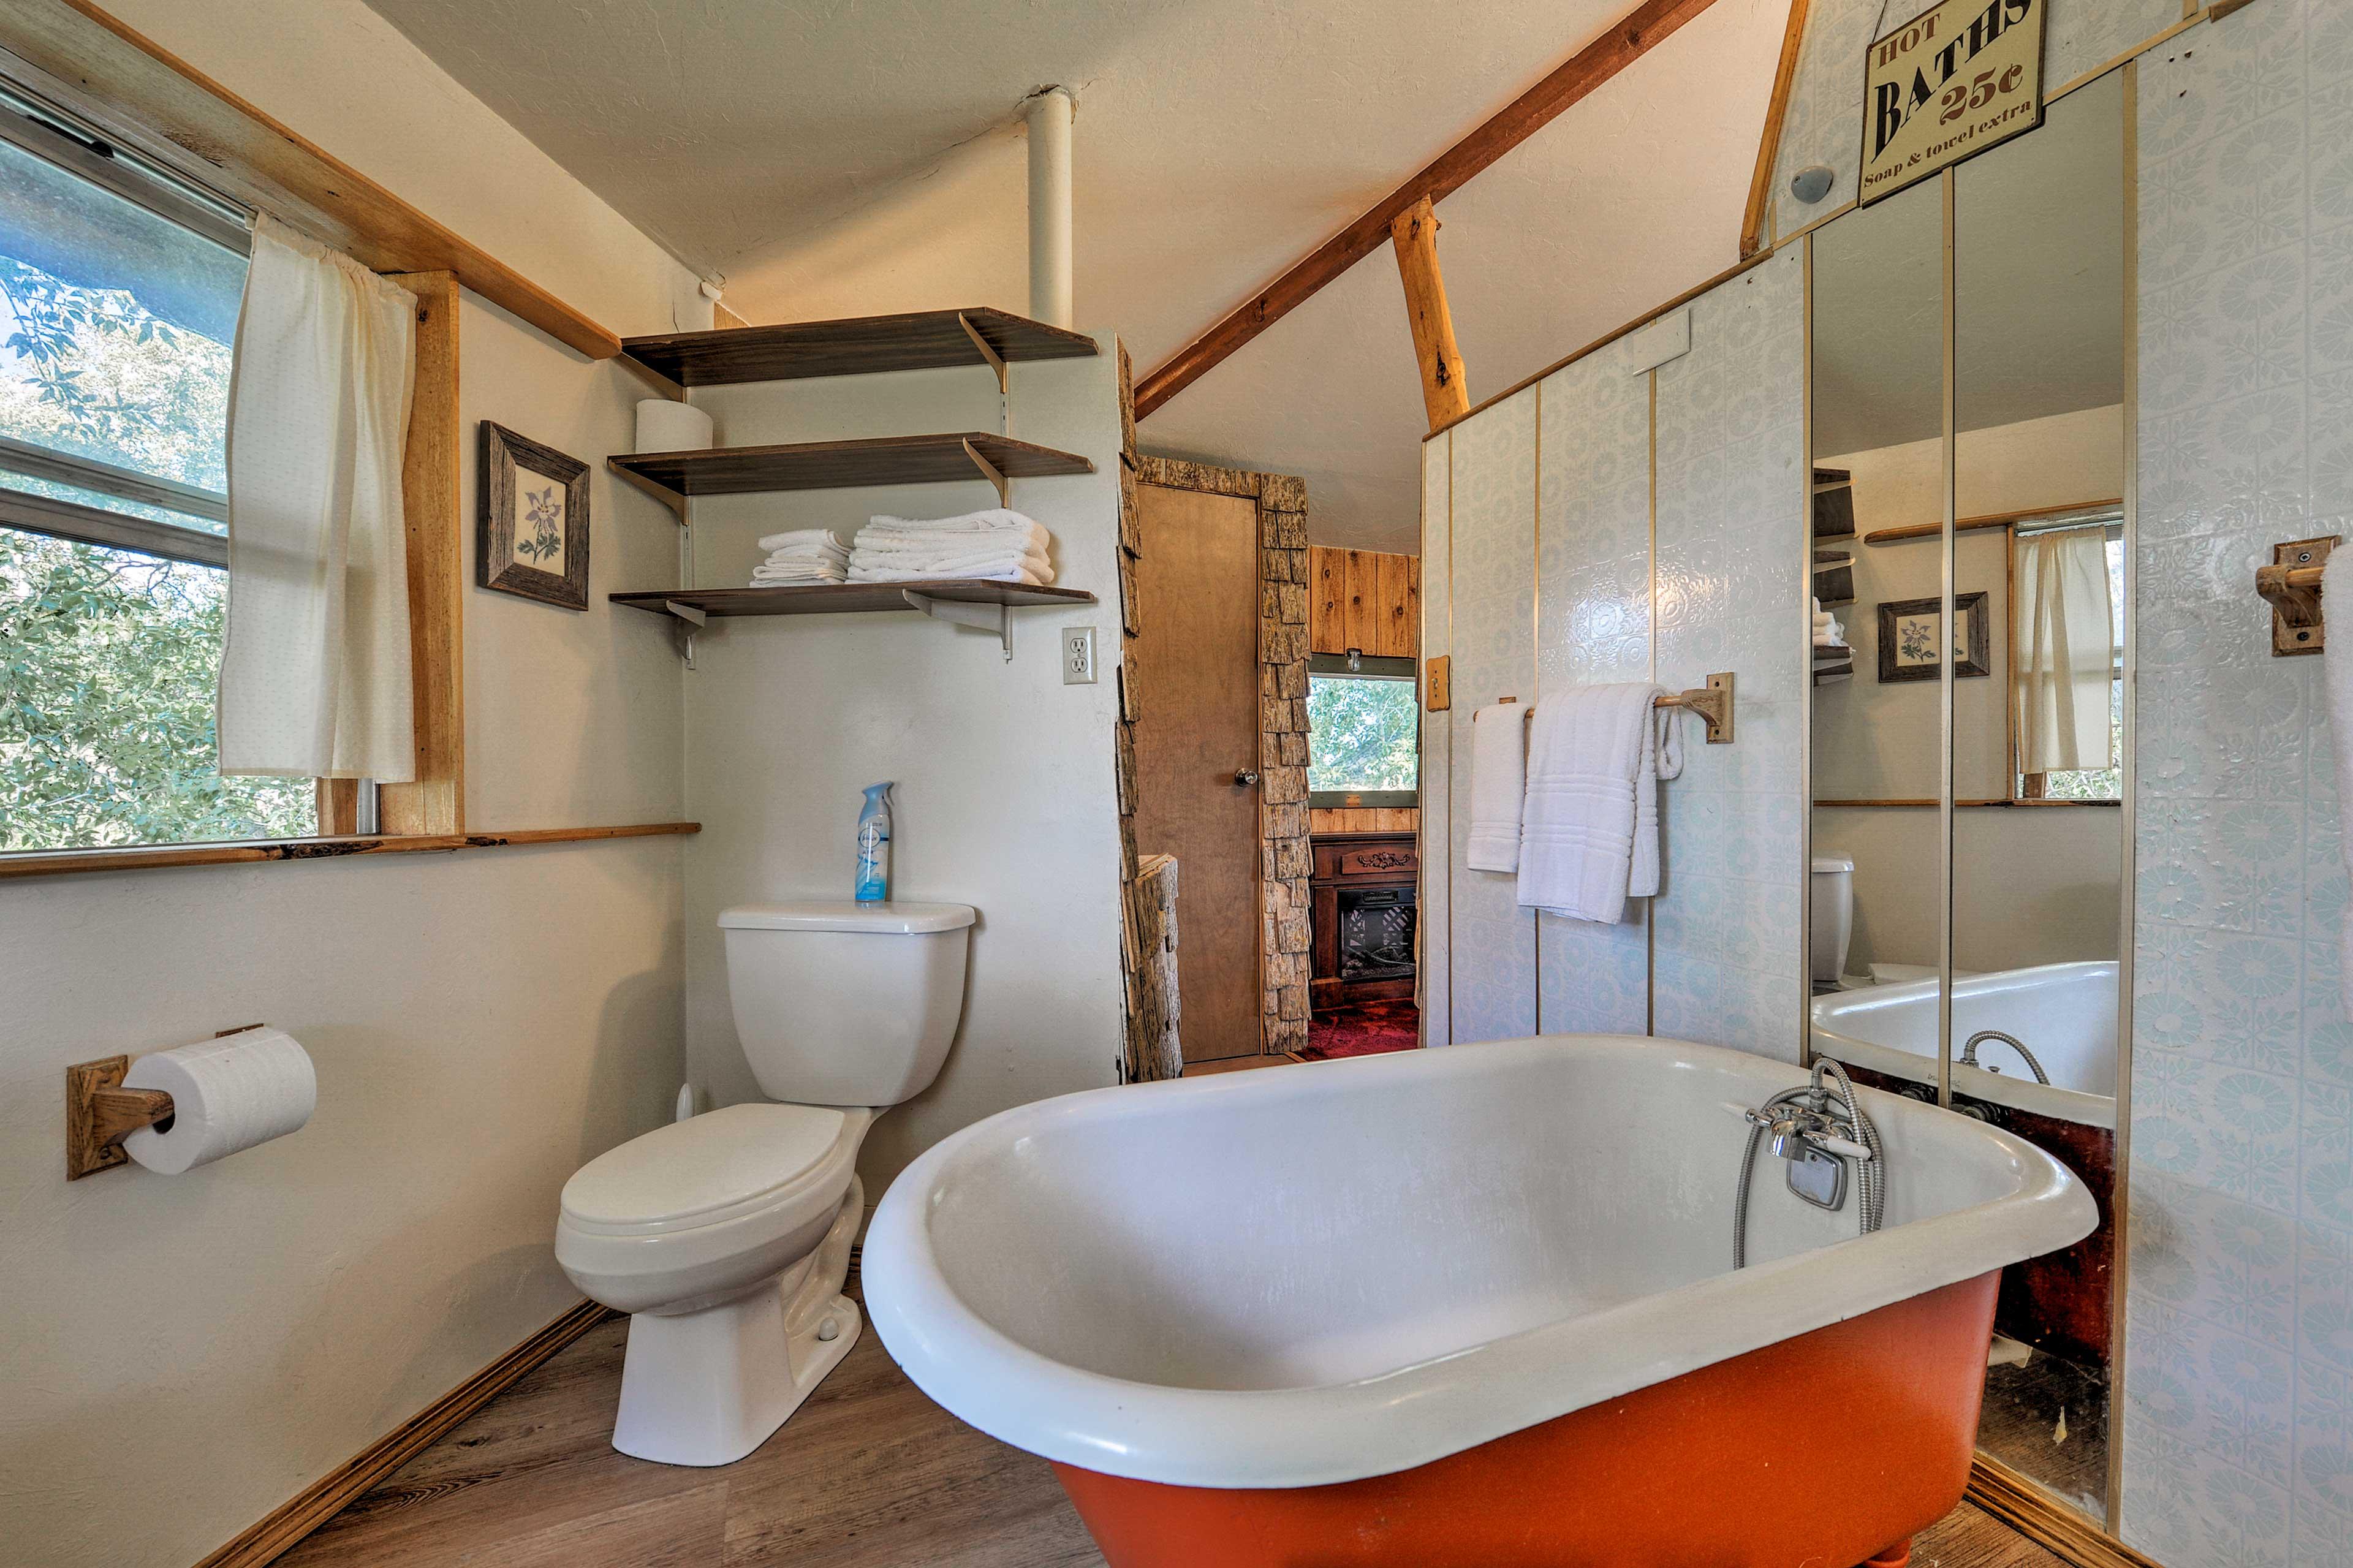 Take a soak in the claw-foot tub.